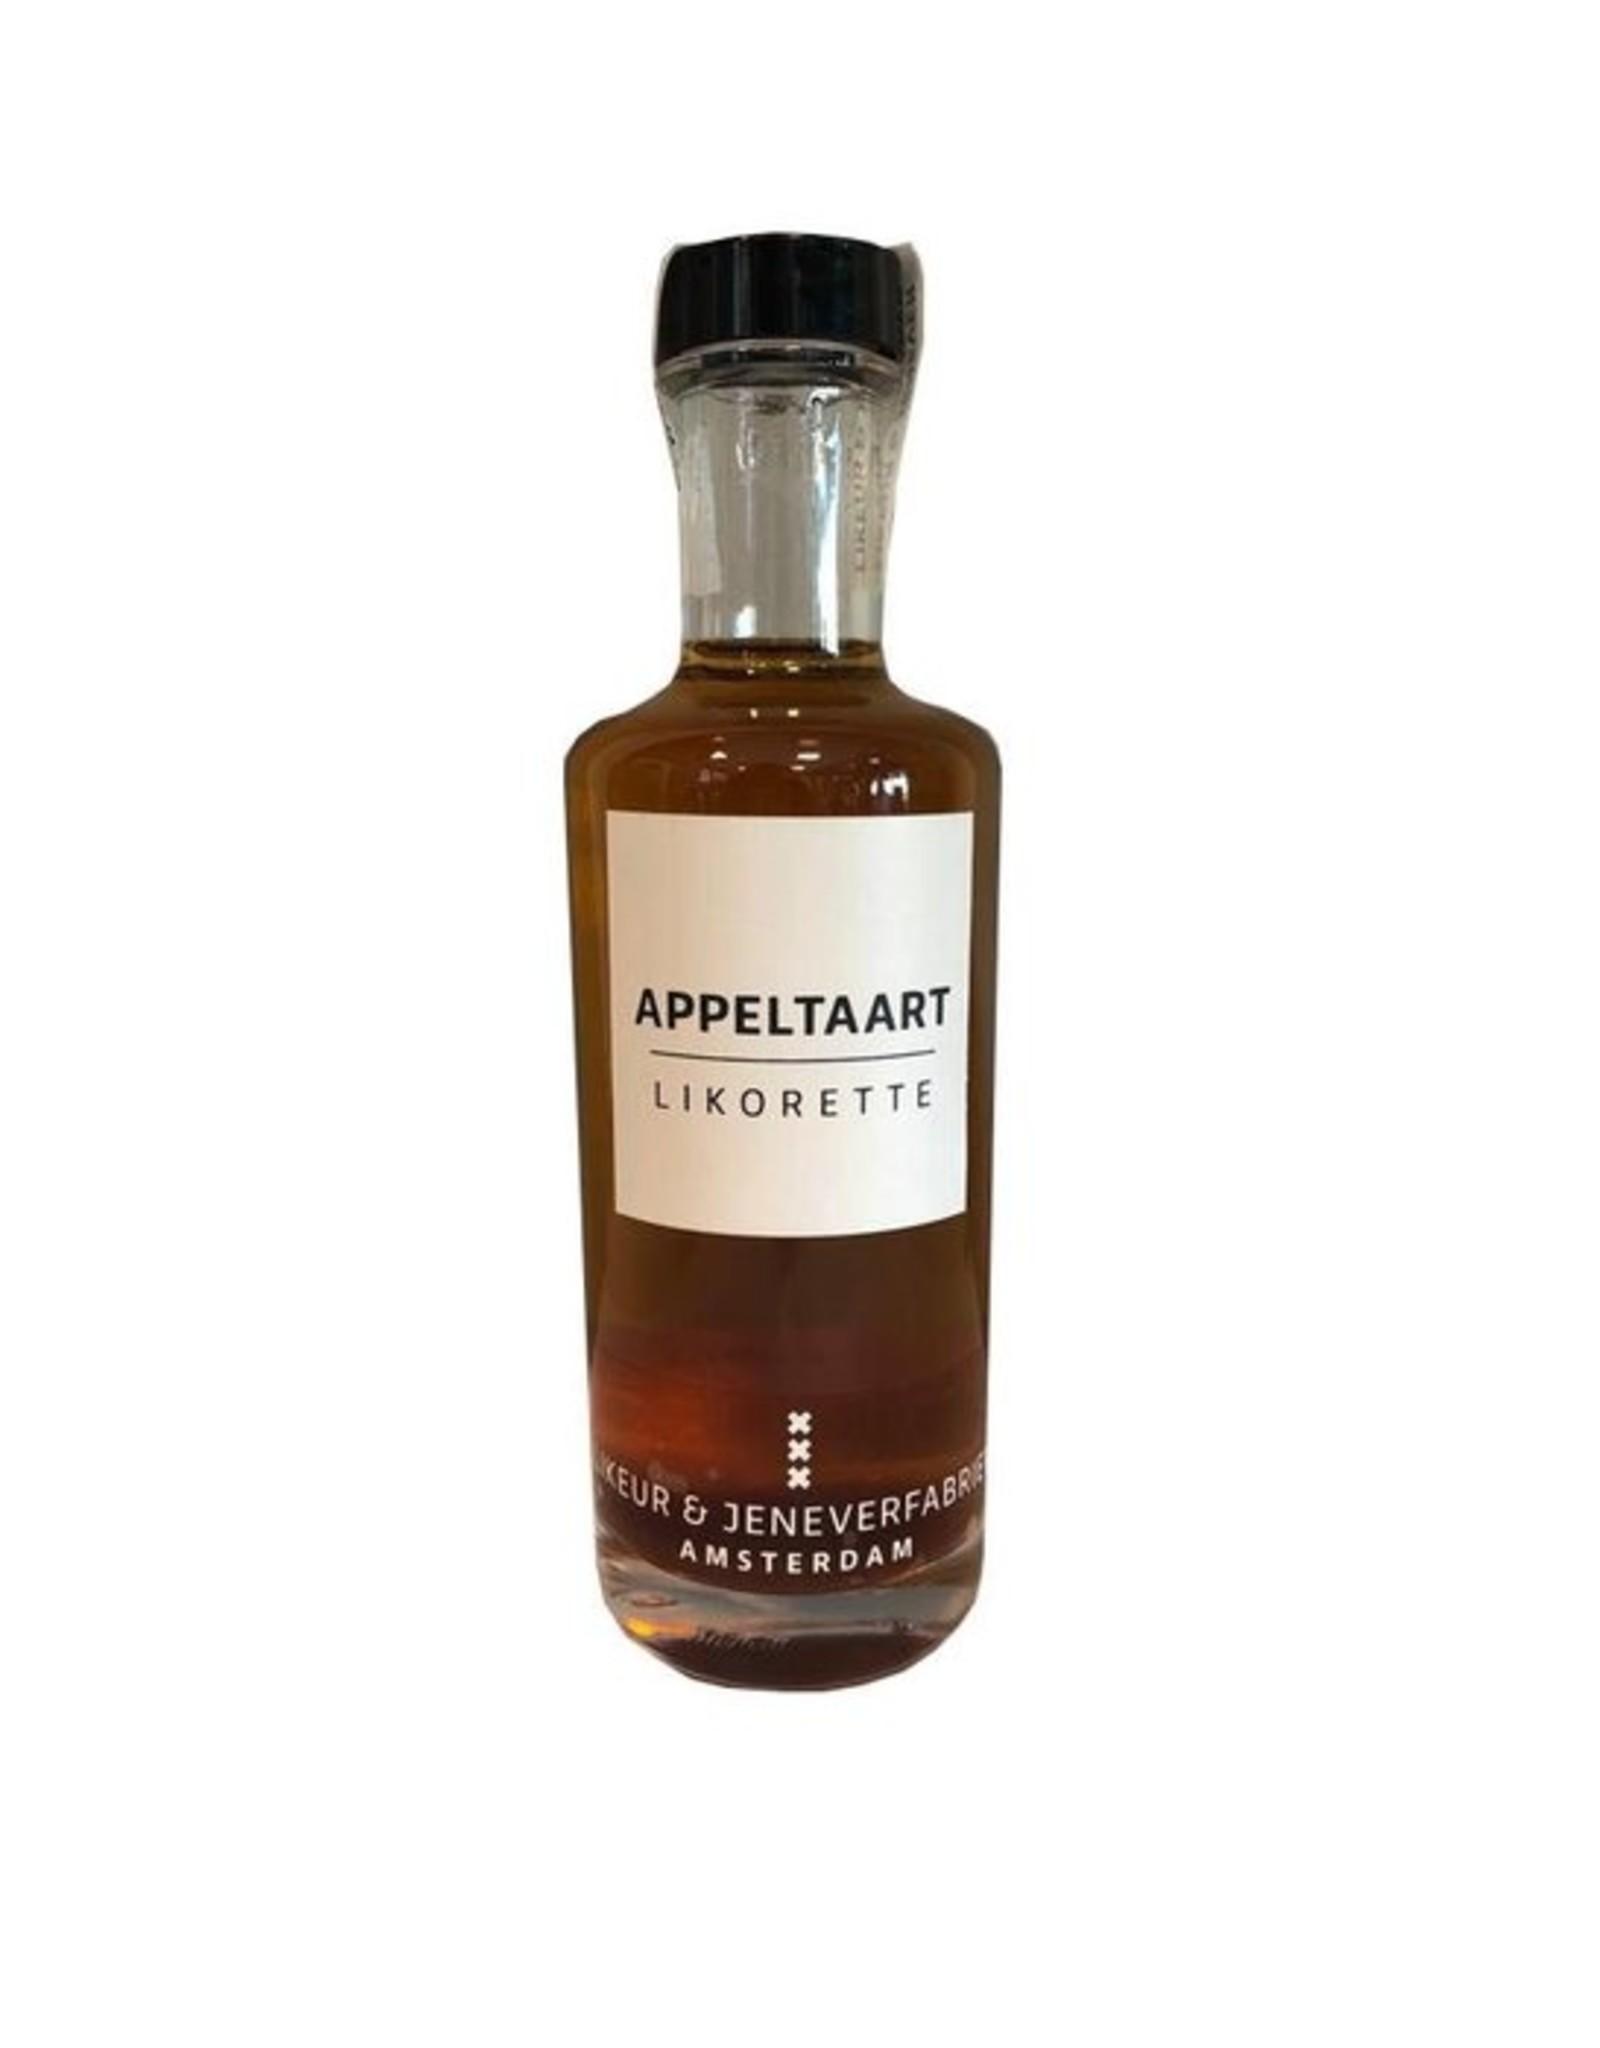 Likorette Appeltaart